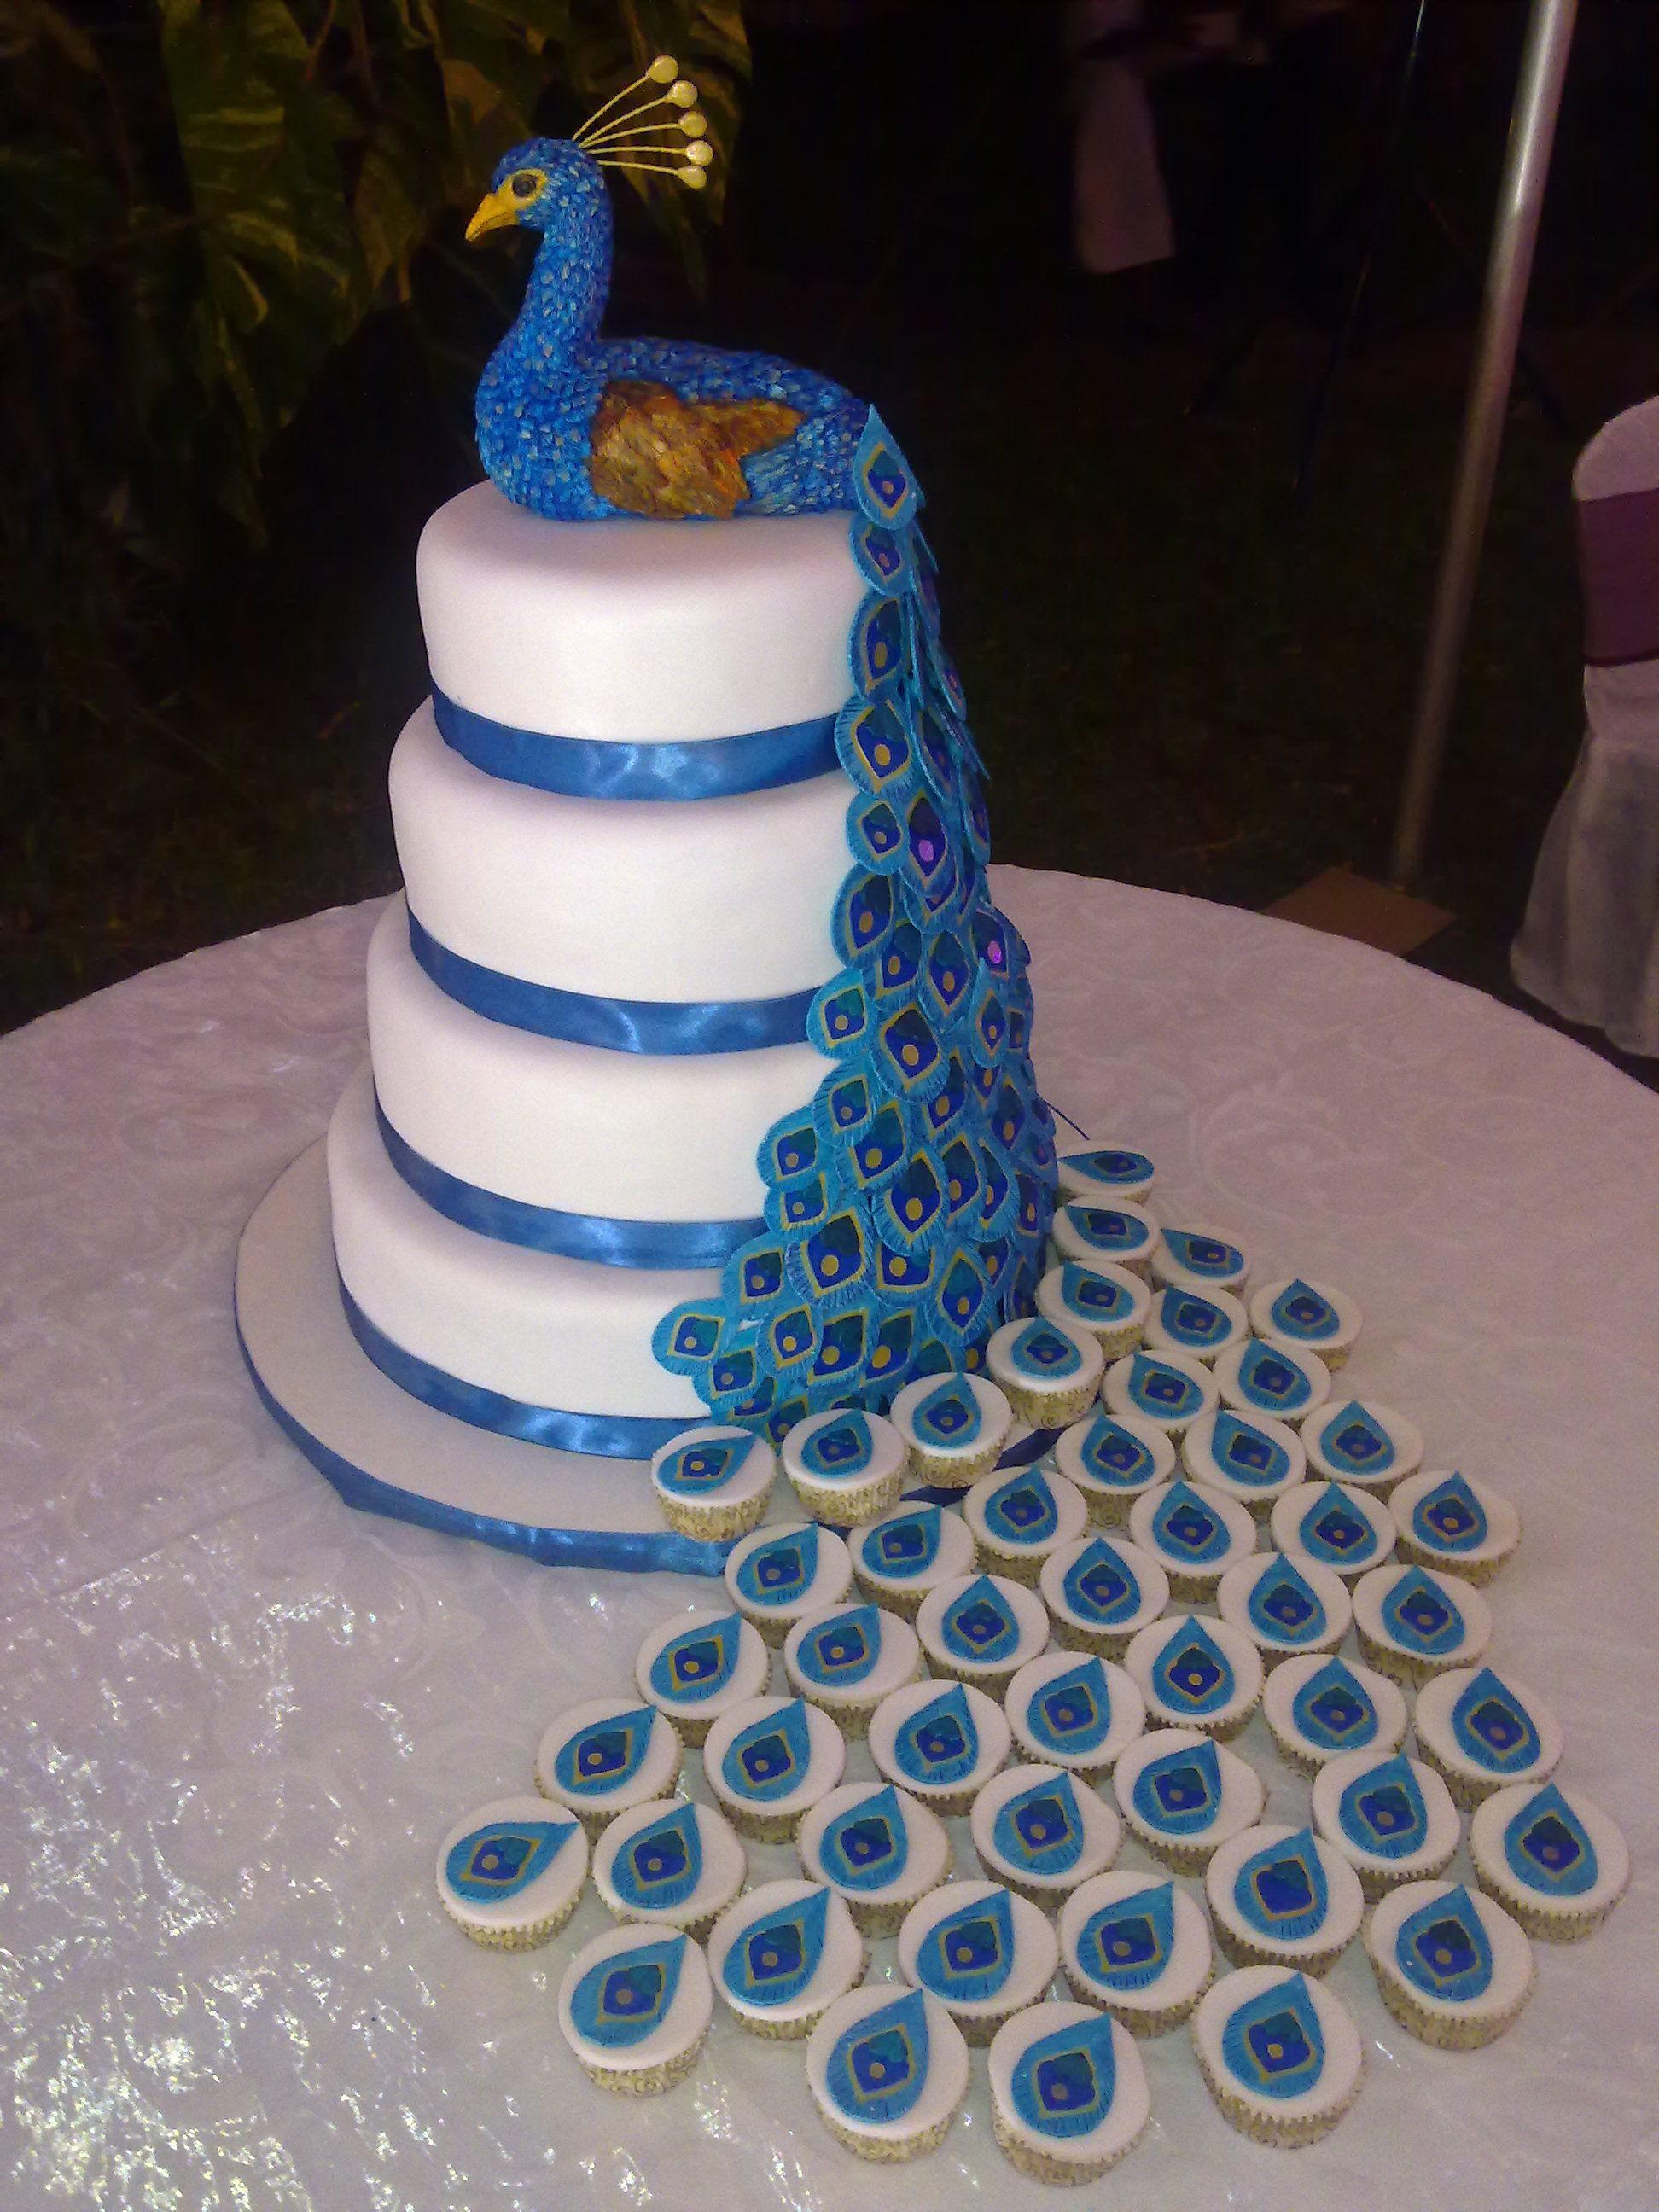 Peacock Wedding Cake With Cupcakes  Peacock & Cupcakes Suzie s Celebration Cakes